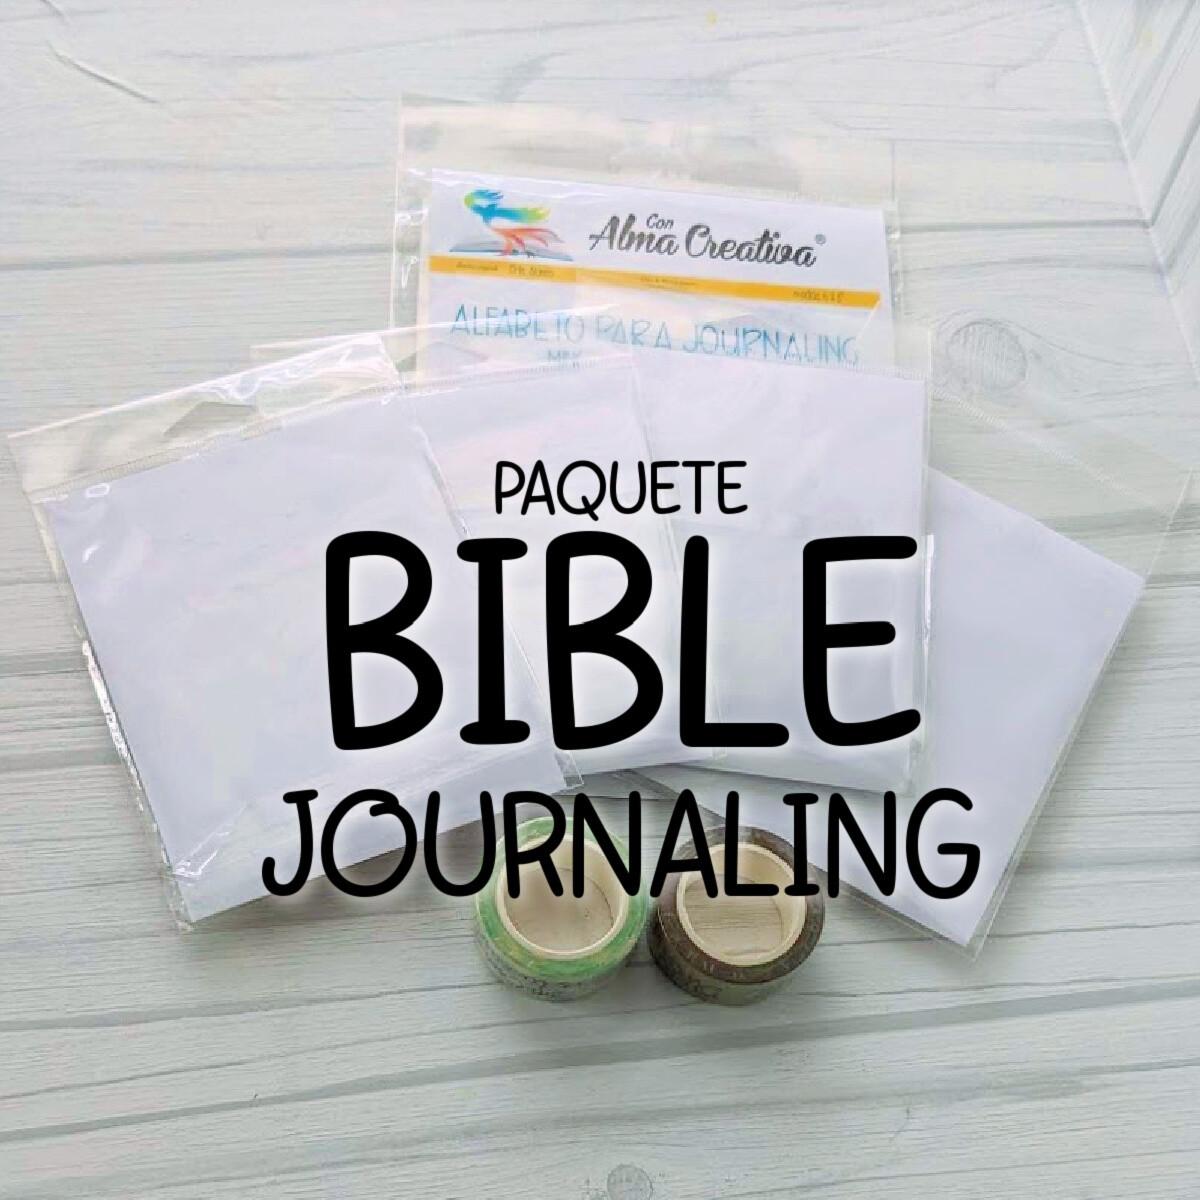 PAQUETE BIBLE JOURNALING